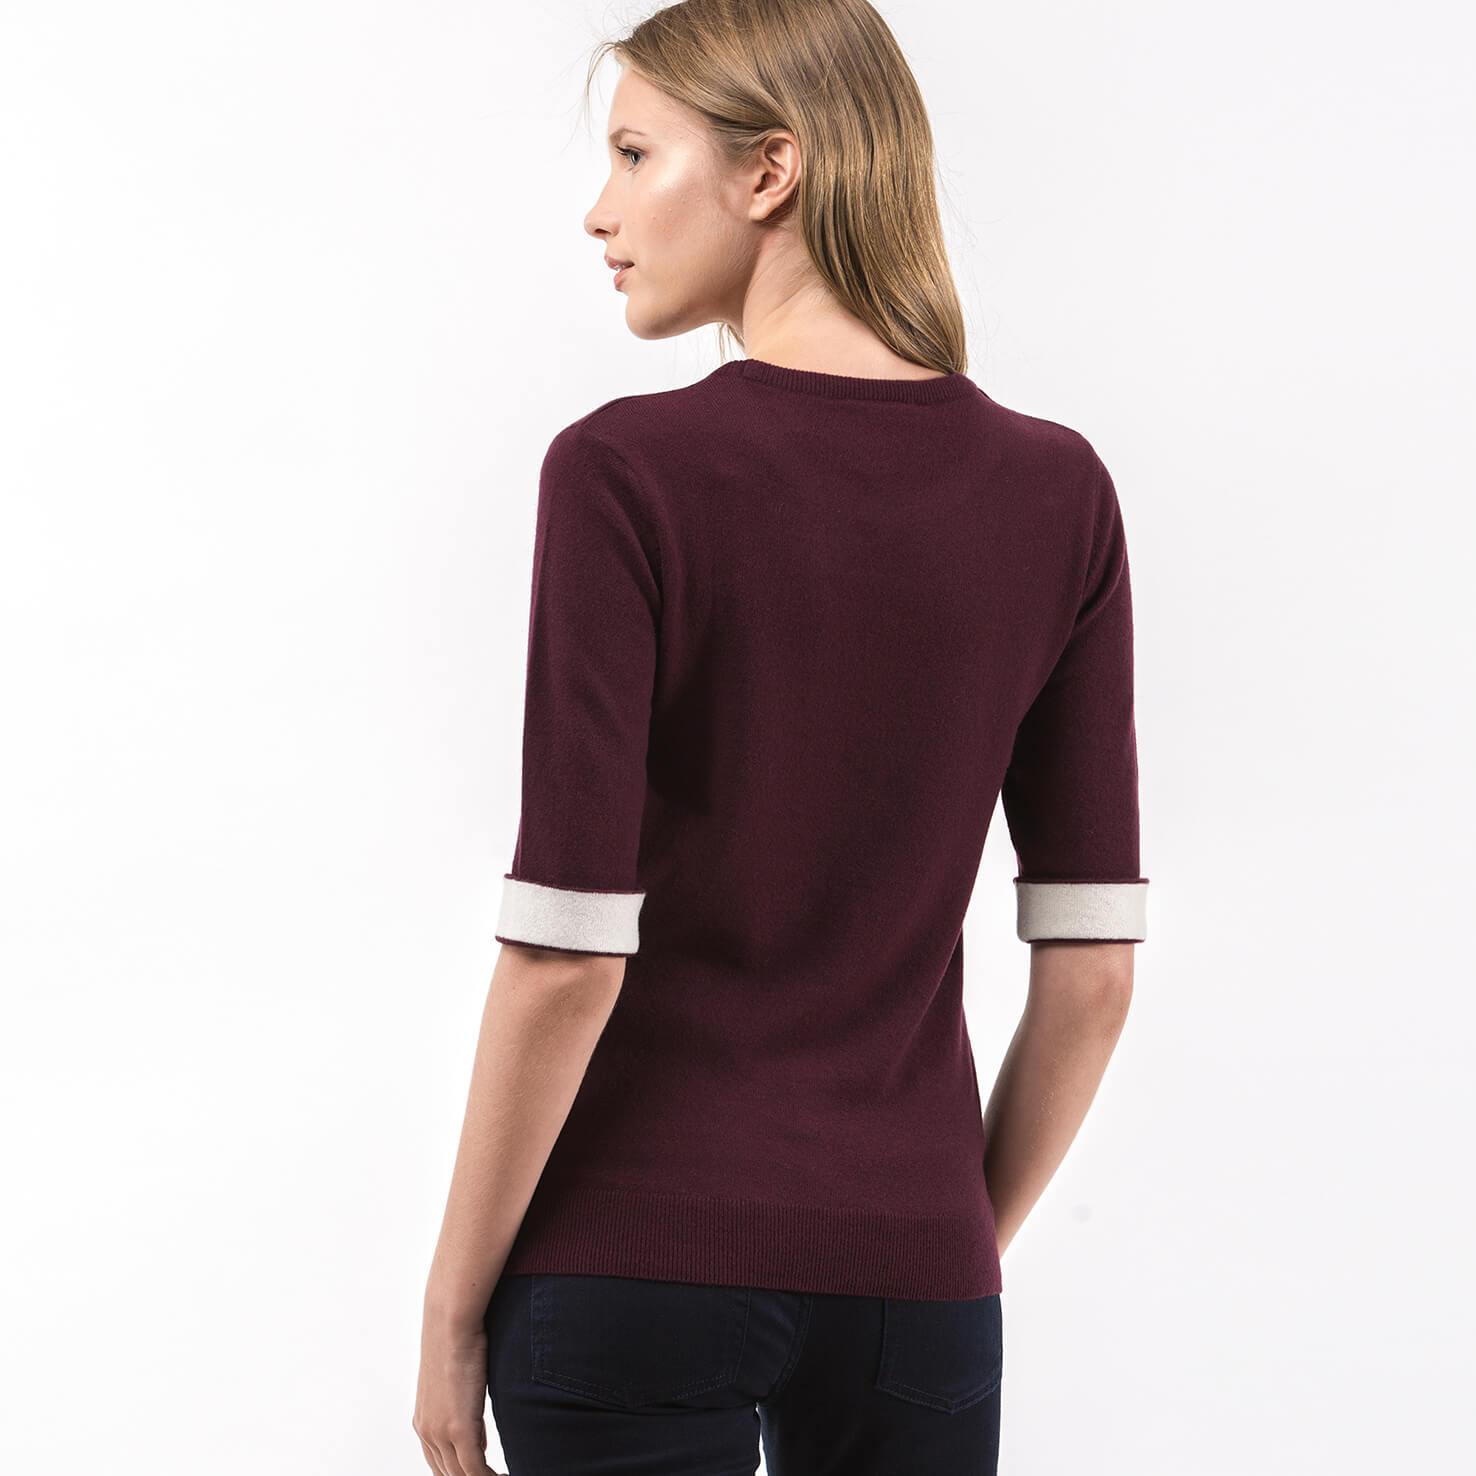 Фото 3 - Женский свитер Lacoste бордового цвета